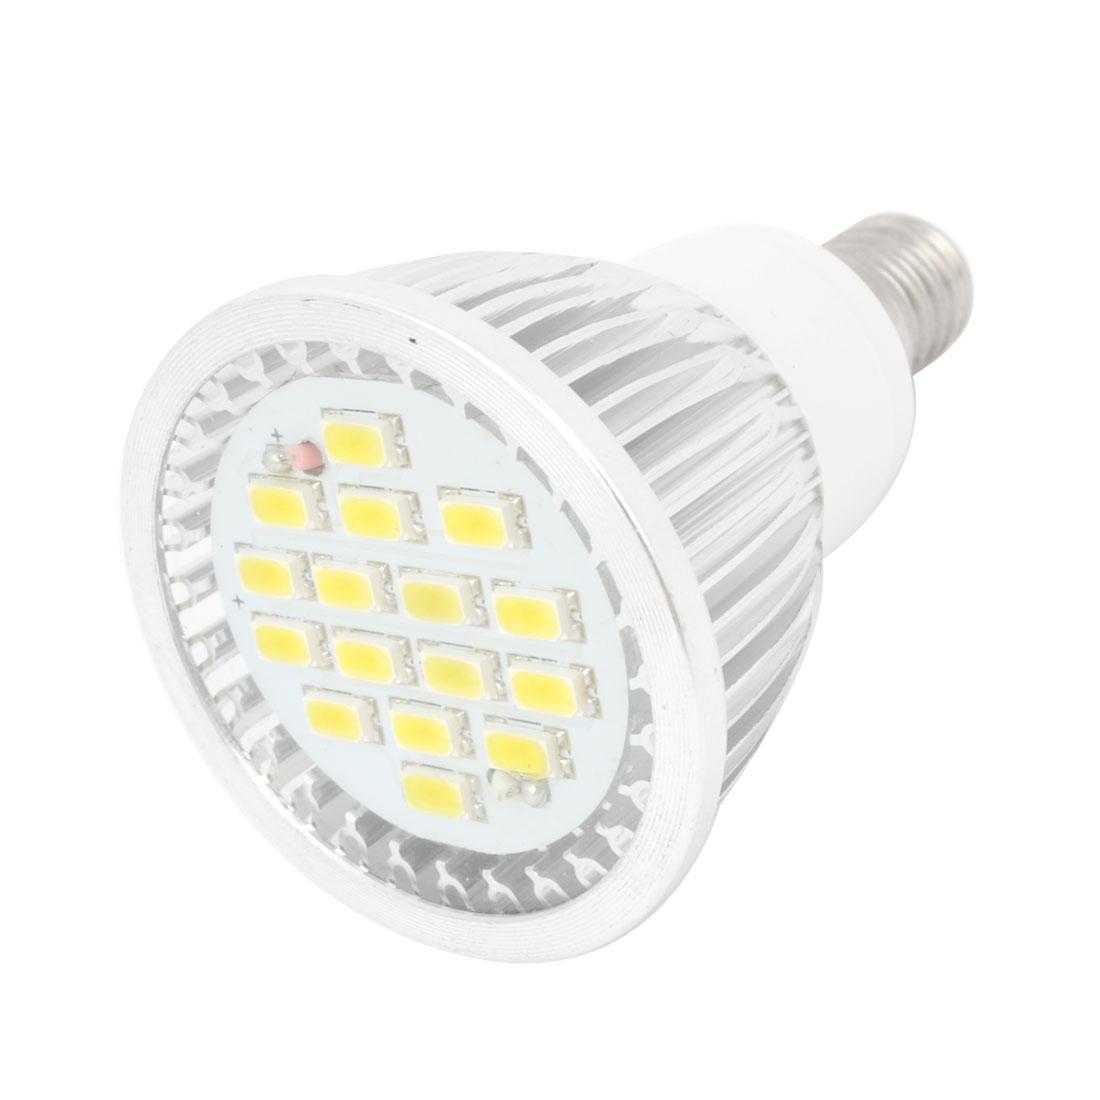 AC 220V E14 Base 16 3528 SMD Warm White LED Down Light Spot light Bulb 3W